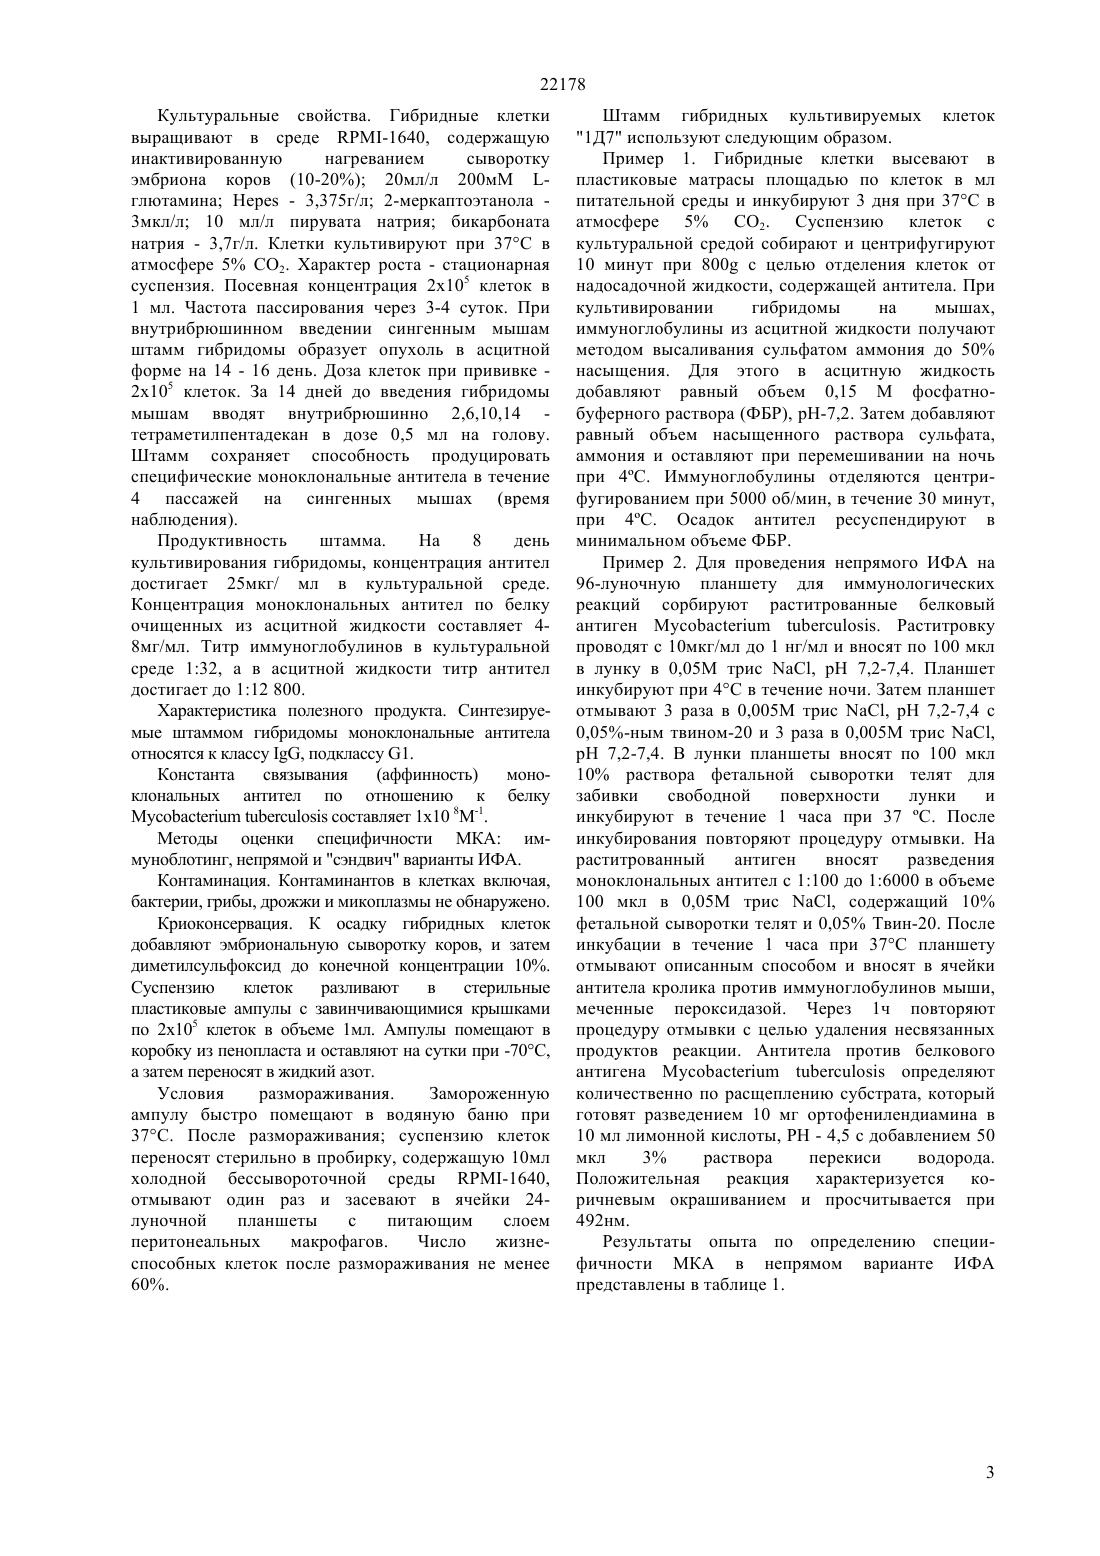 Ифа тест на туберкулез: значение и информативность исследования